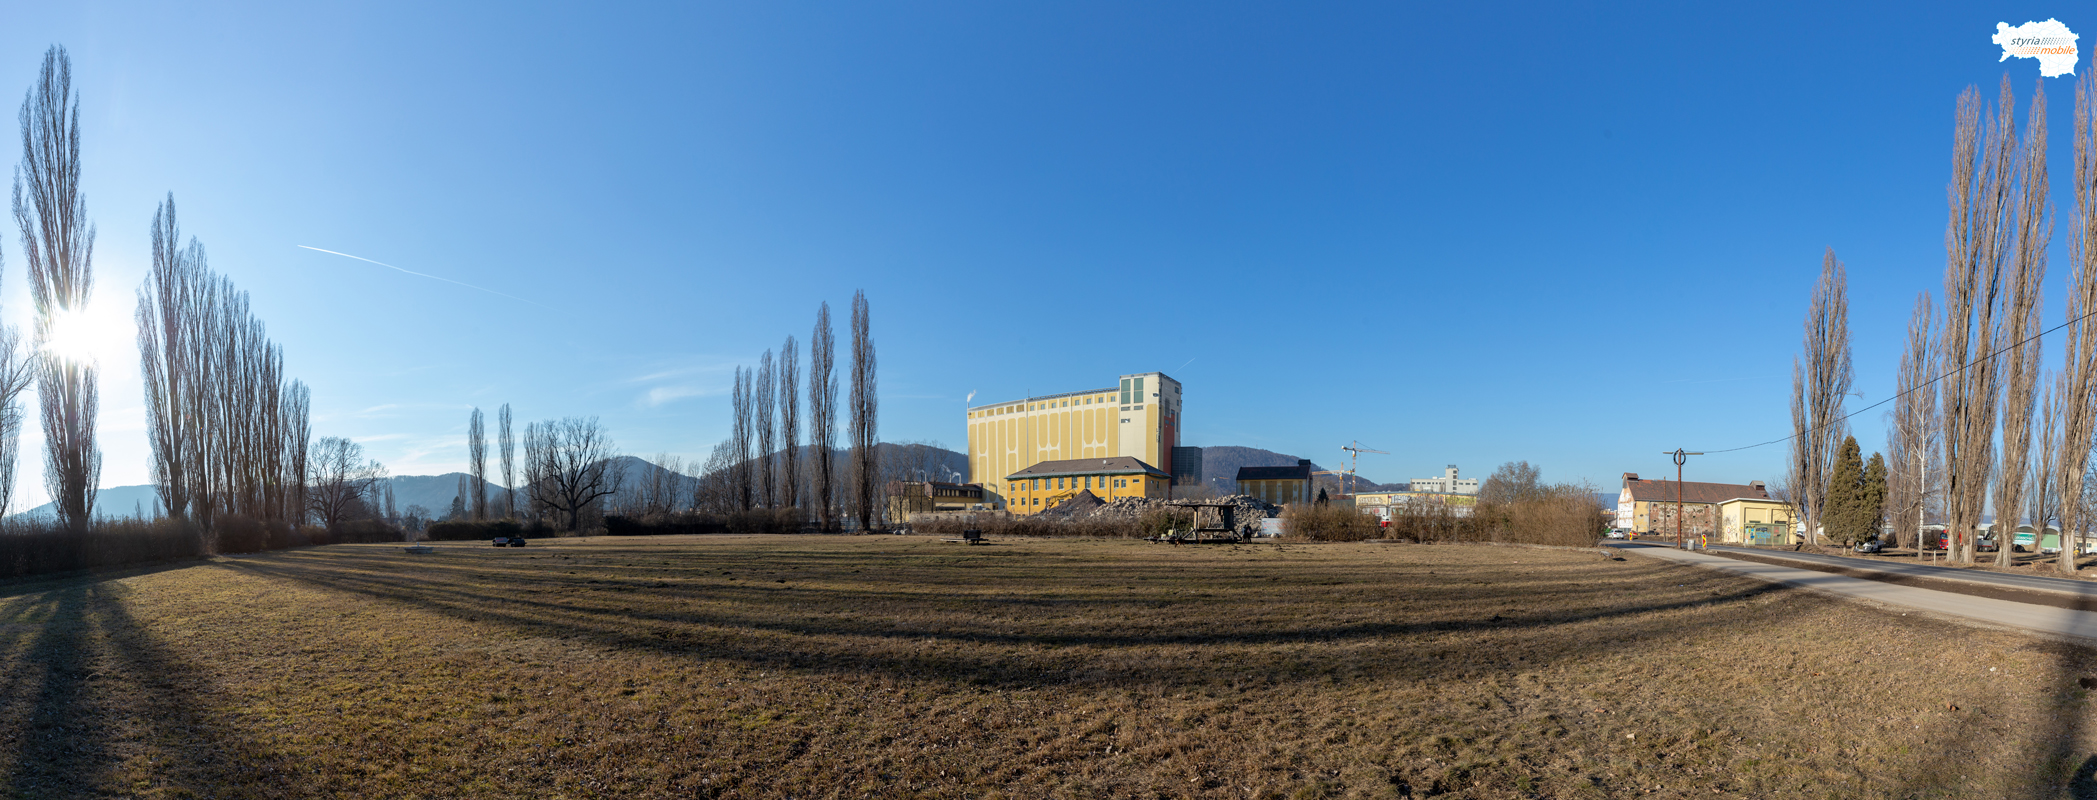 Reininghaus, 09.02.2019